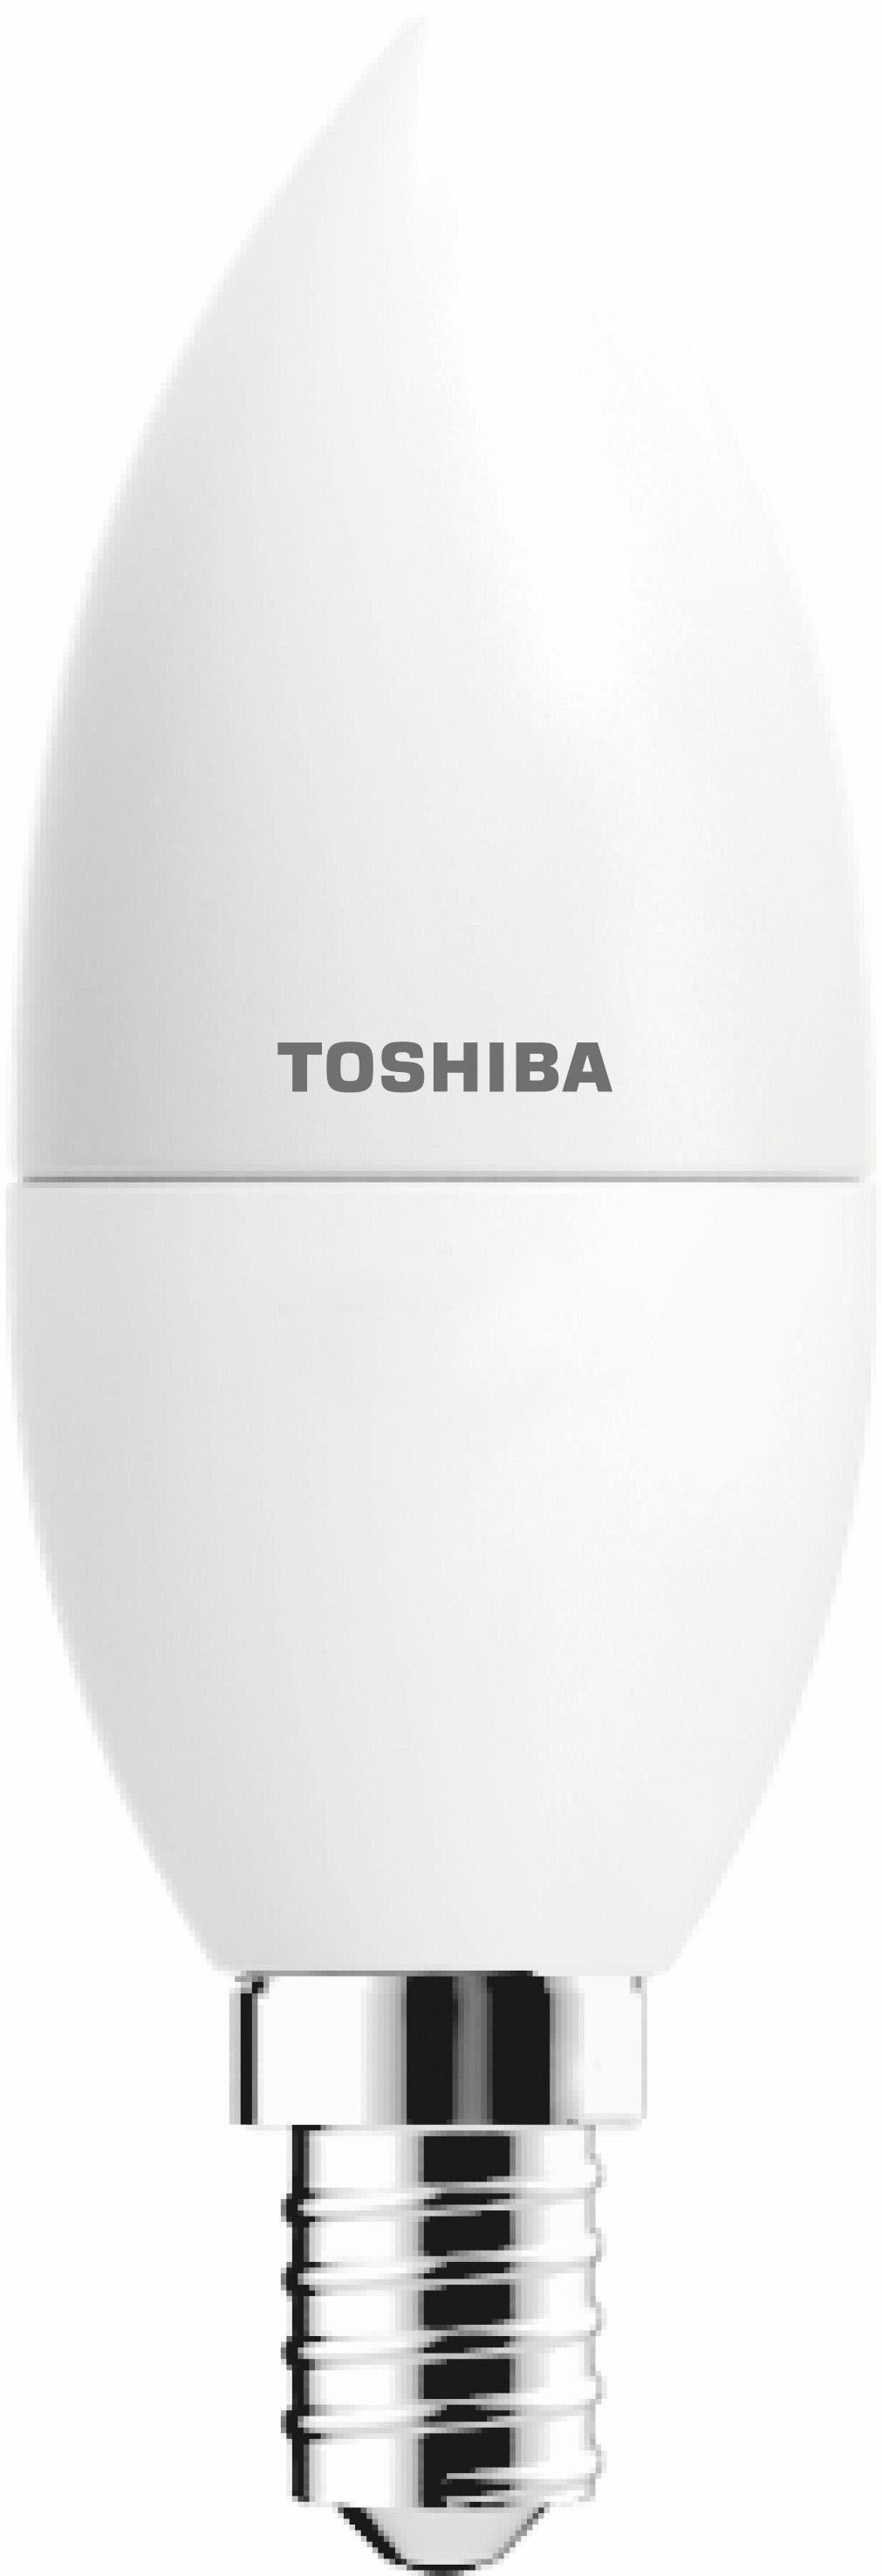 Led Lampen Dimbaar : Toshiba led lamp set van e dimbaar snel online gekocht otto